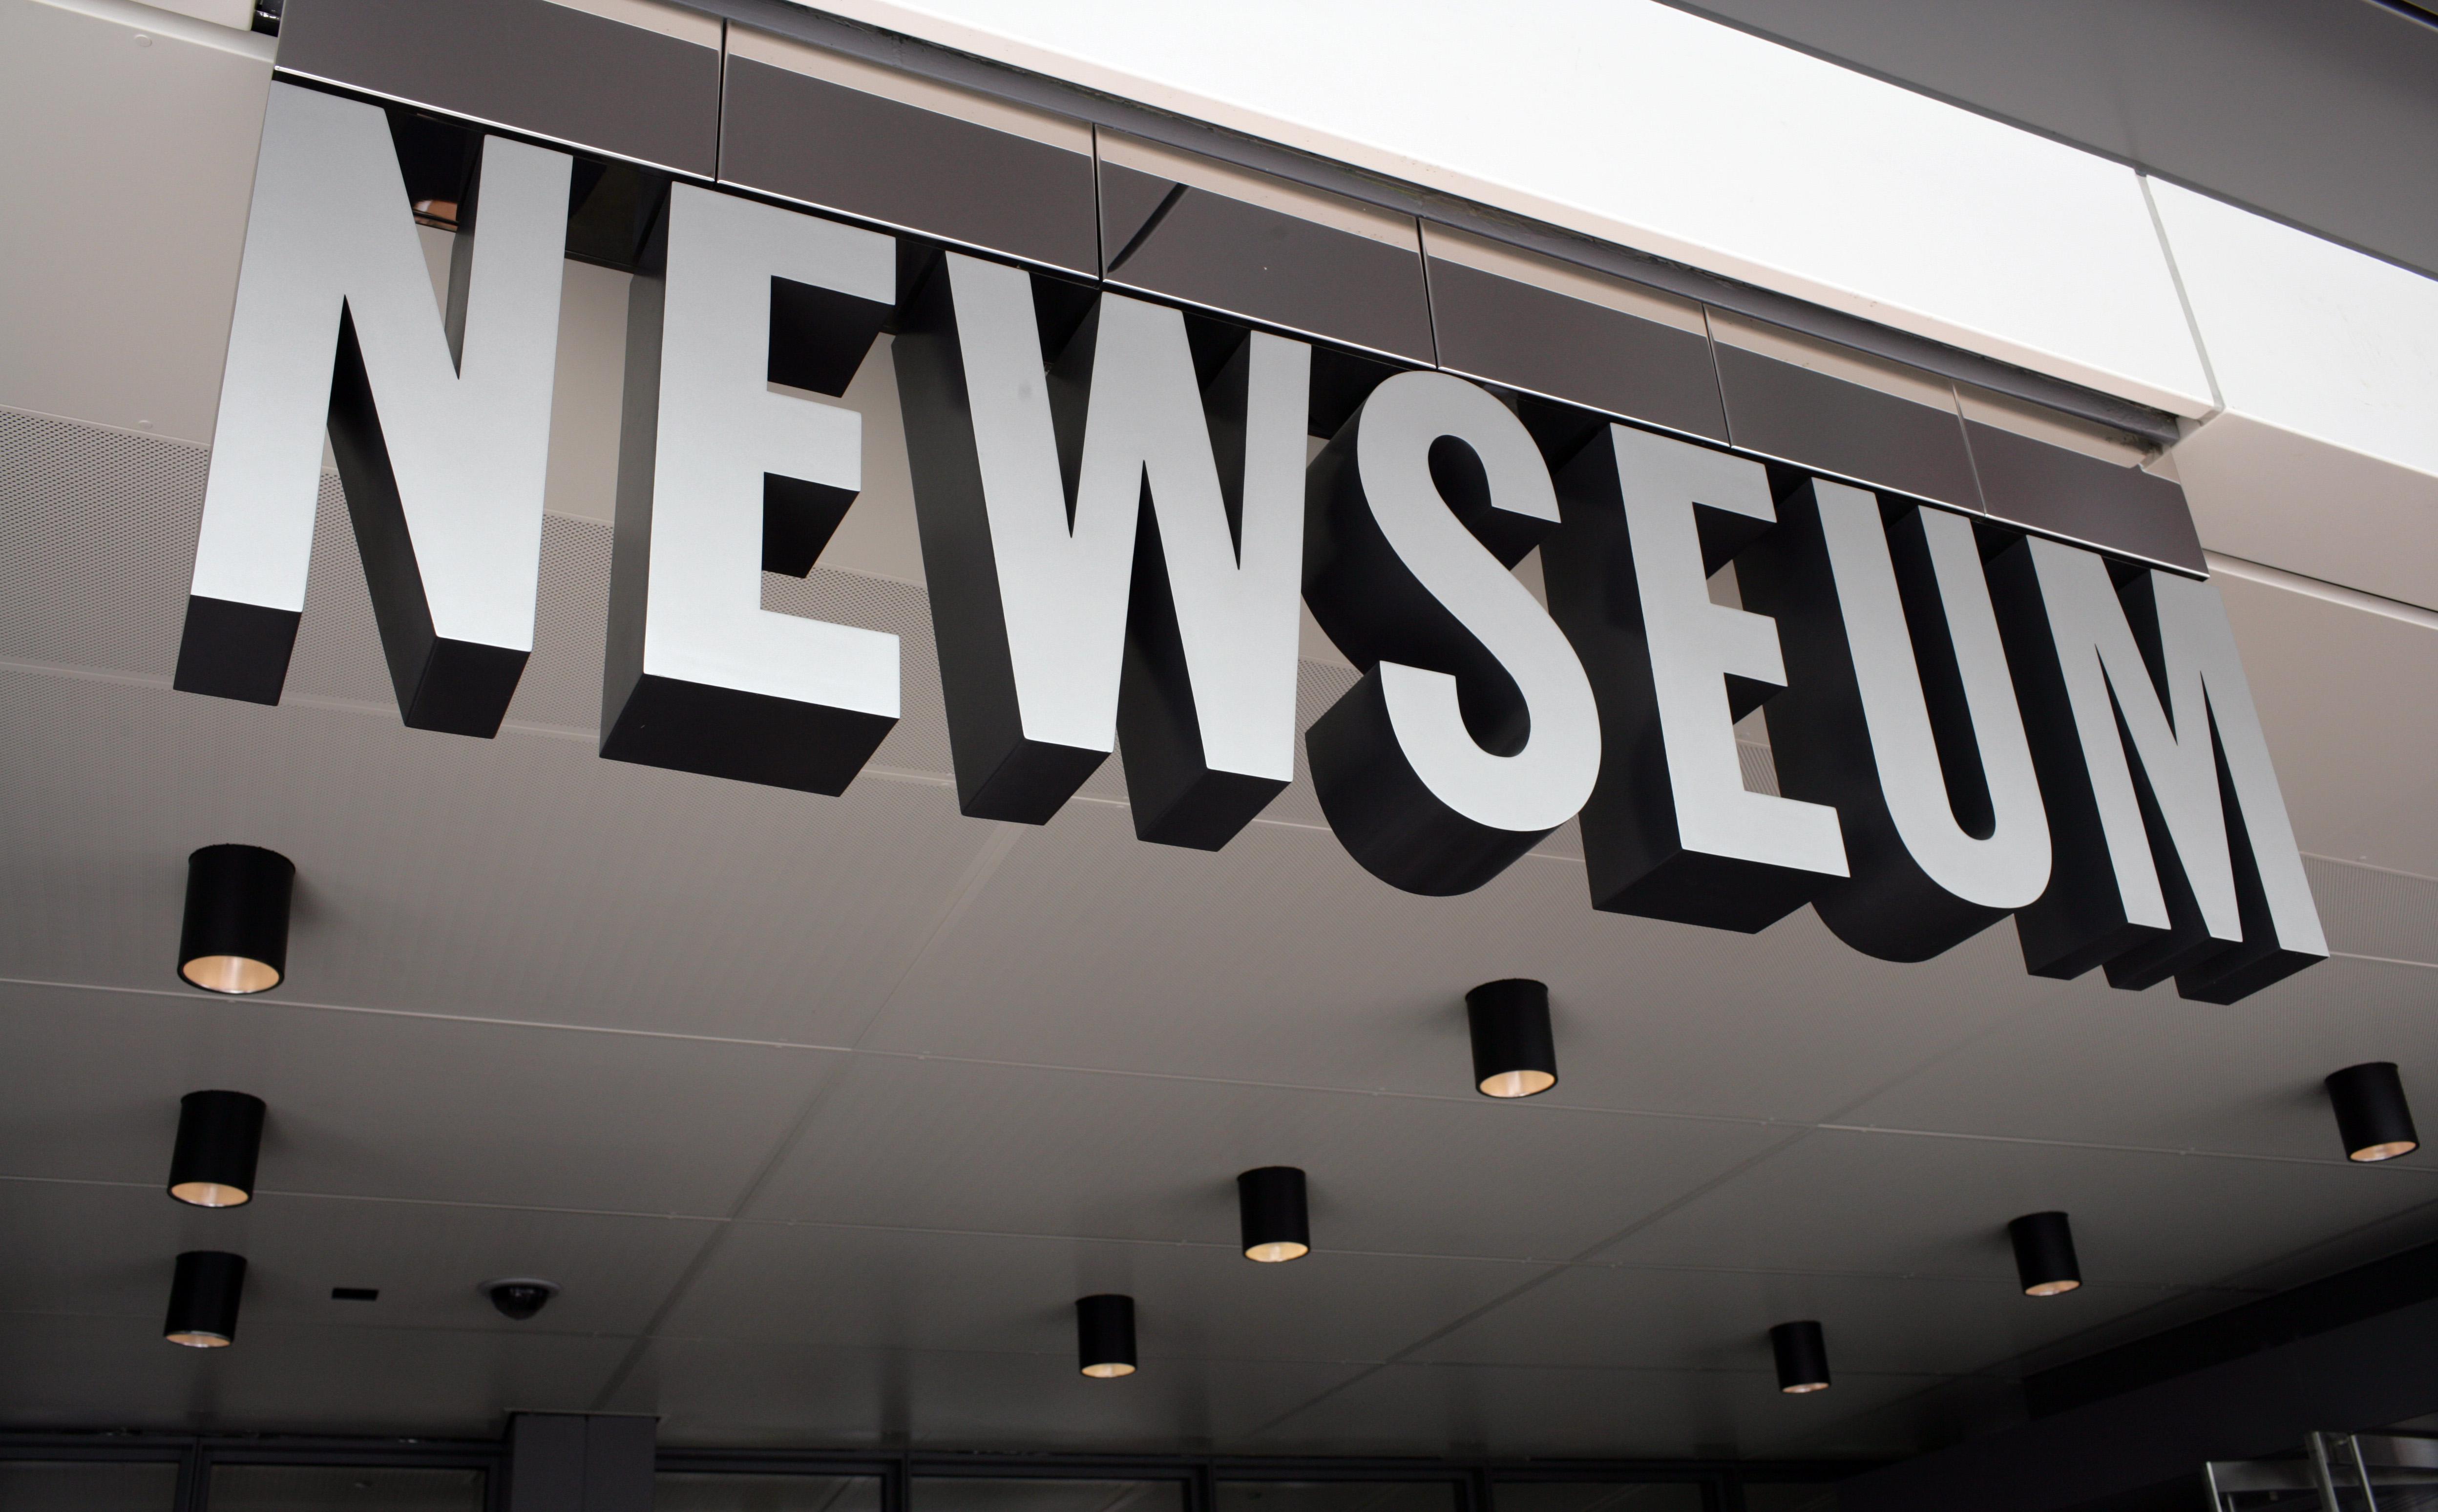 Entrance of Newseum.